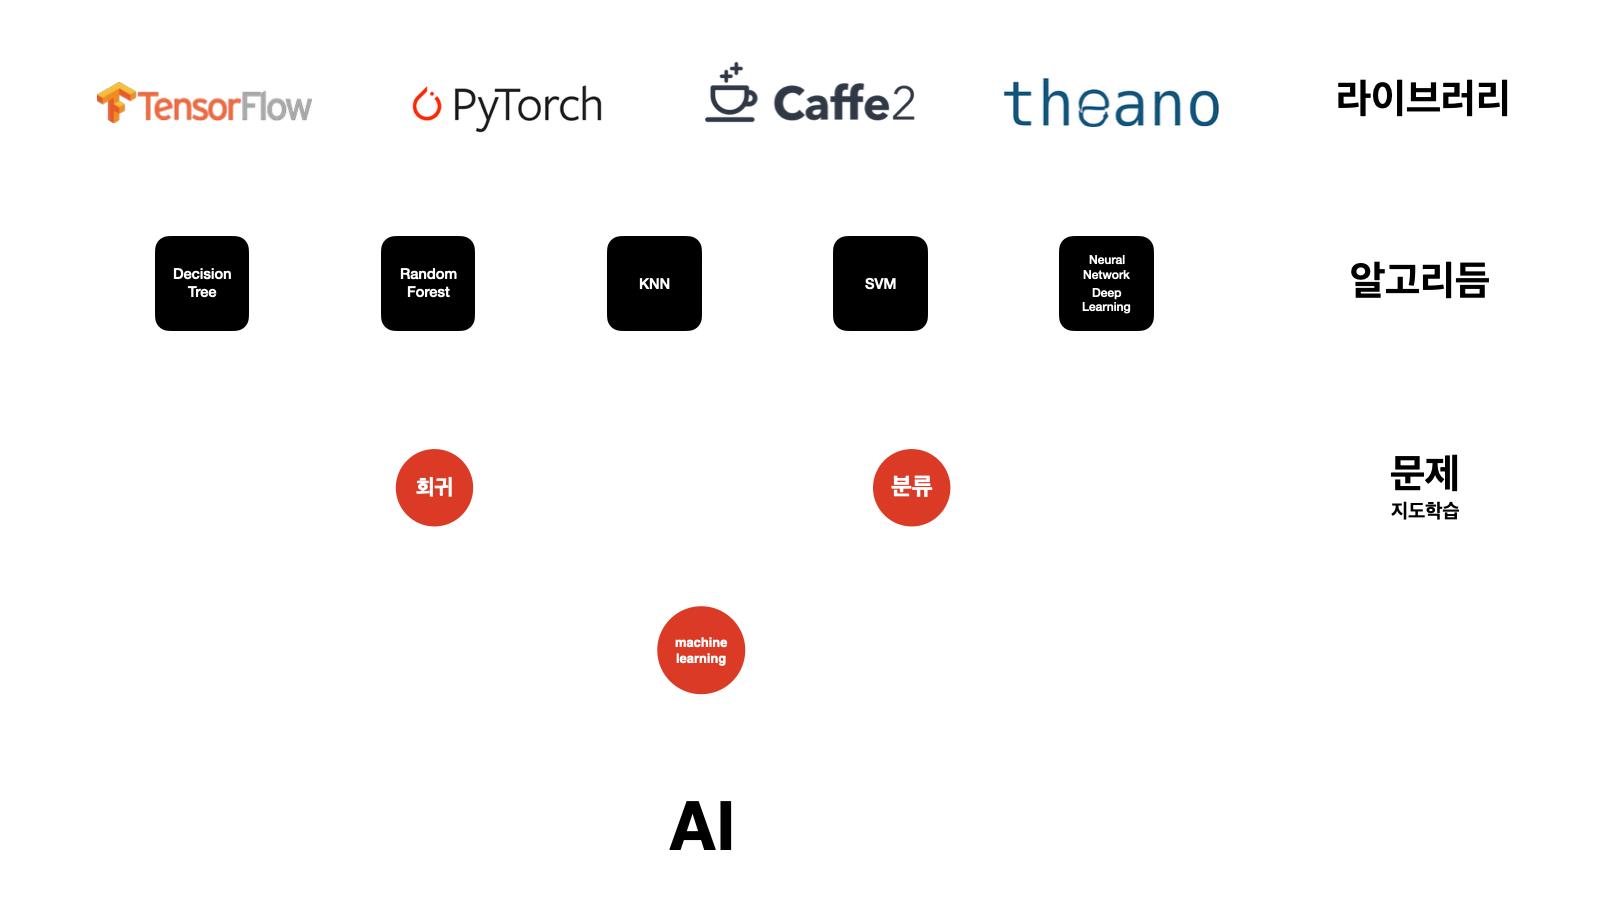 AI에서부터 라이브러리까지 이어지는 계층구조